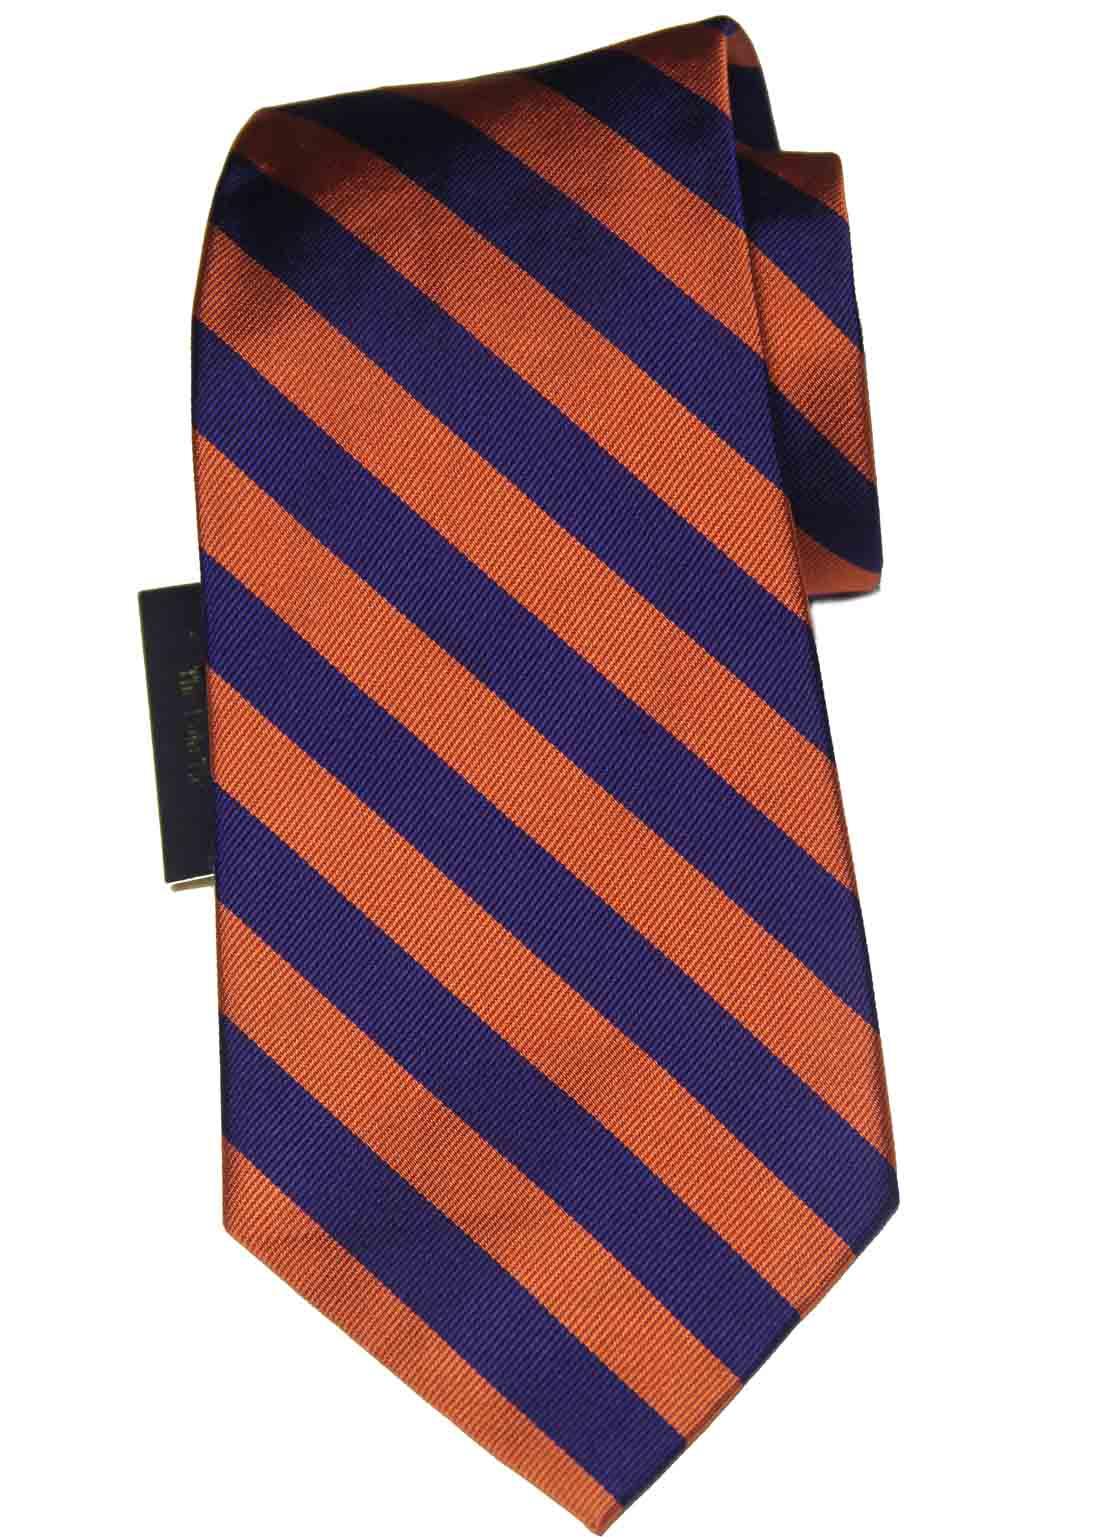 Polo by Ralph Lauren Repp Stripe Tie Silk Orange Purple Men's Short 56 inches